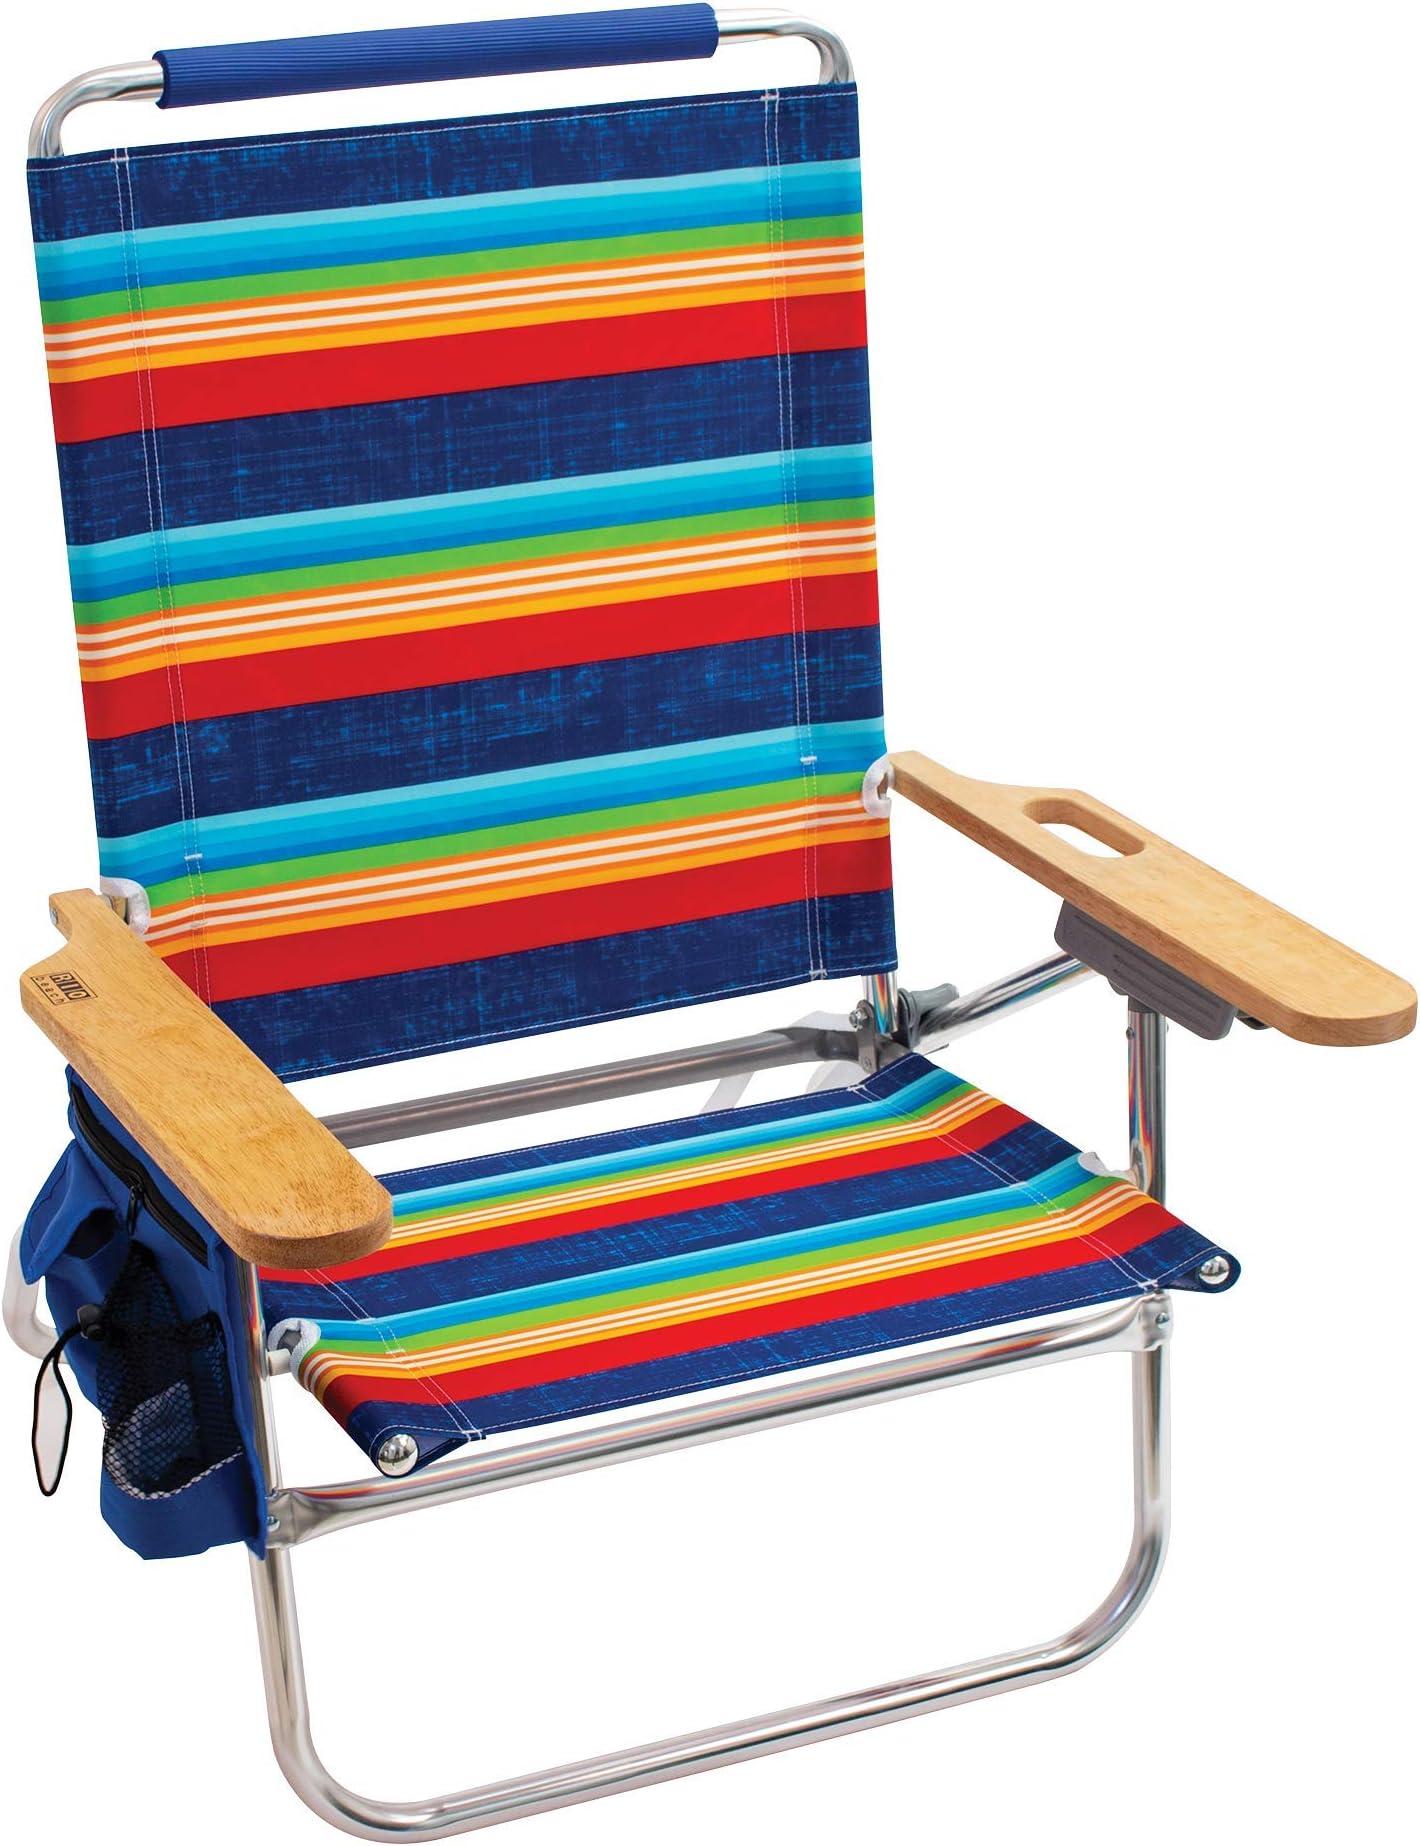 Amazon Com Rio Gear Beach Genuine Beach Bum 4 Position 12 Seat Height Folding Beach Chair Surf Power Blue Multi Stripe Sports Outdoors